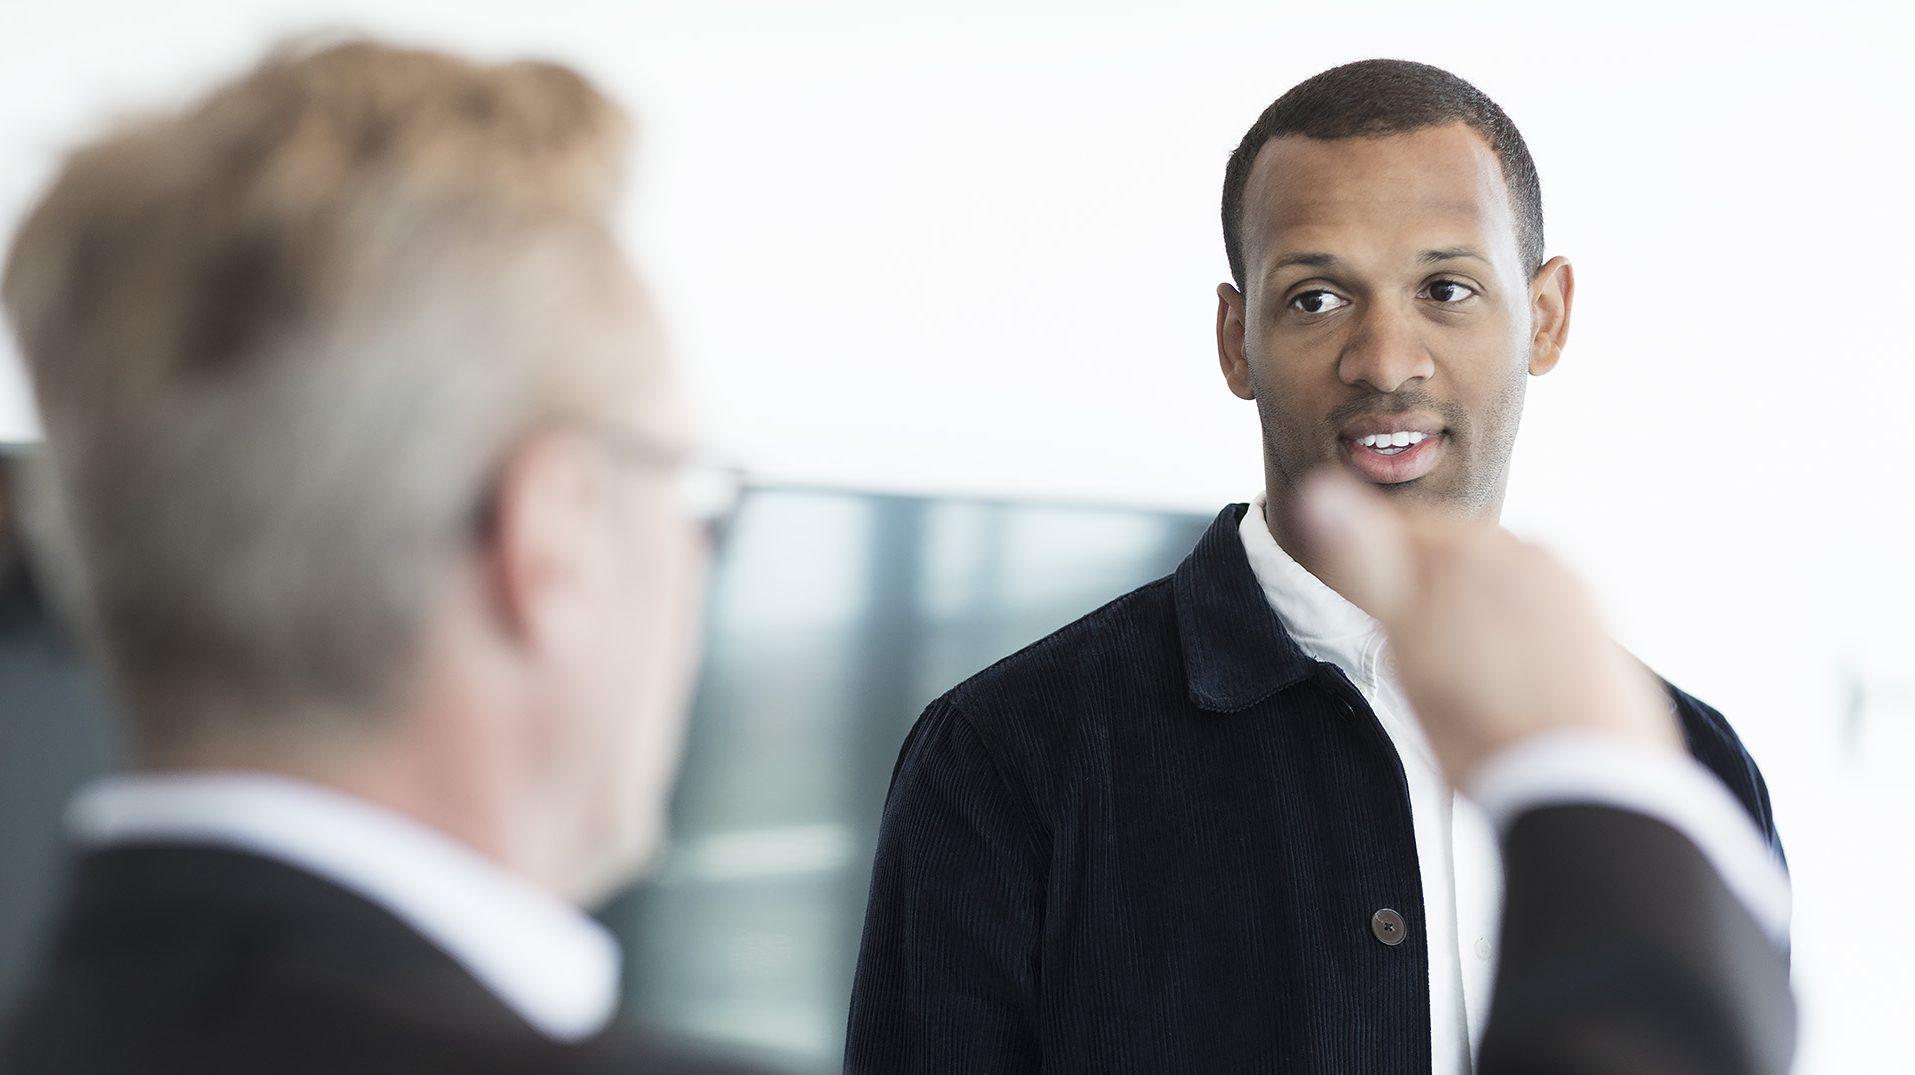 Men in suit talking